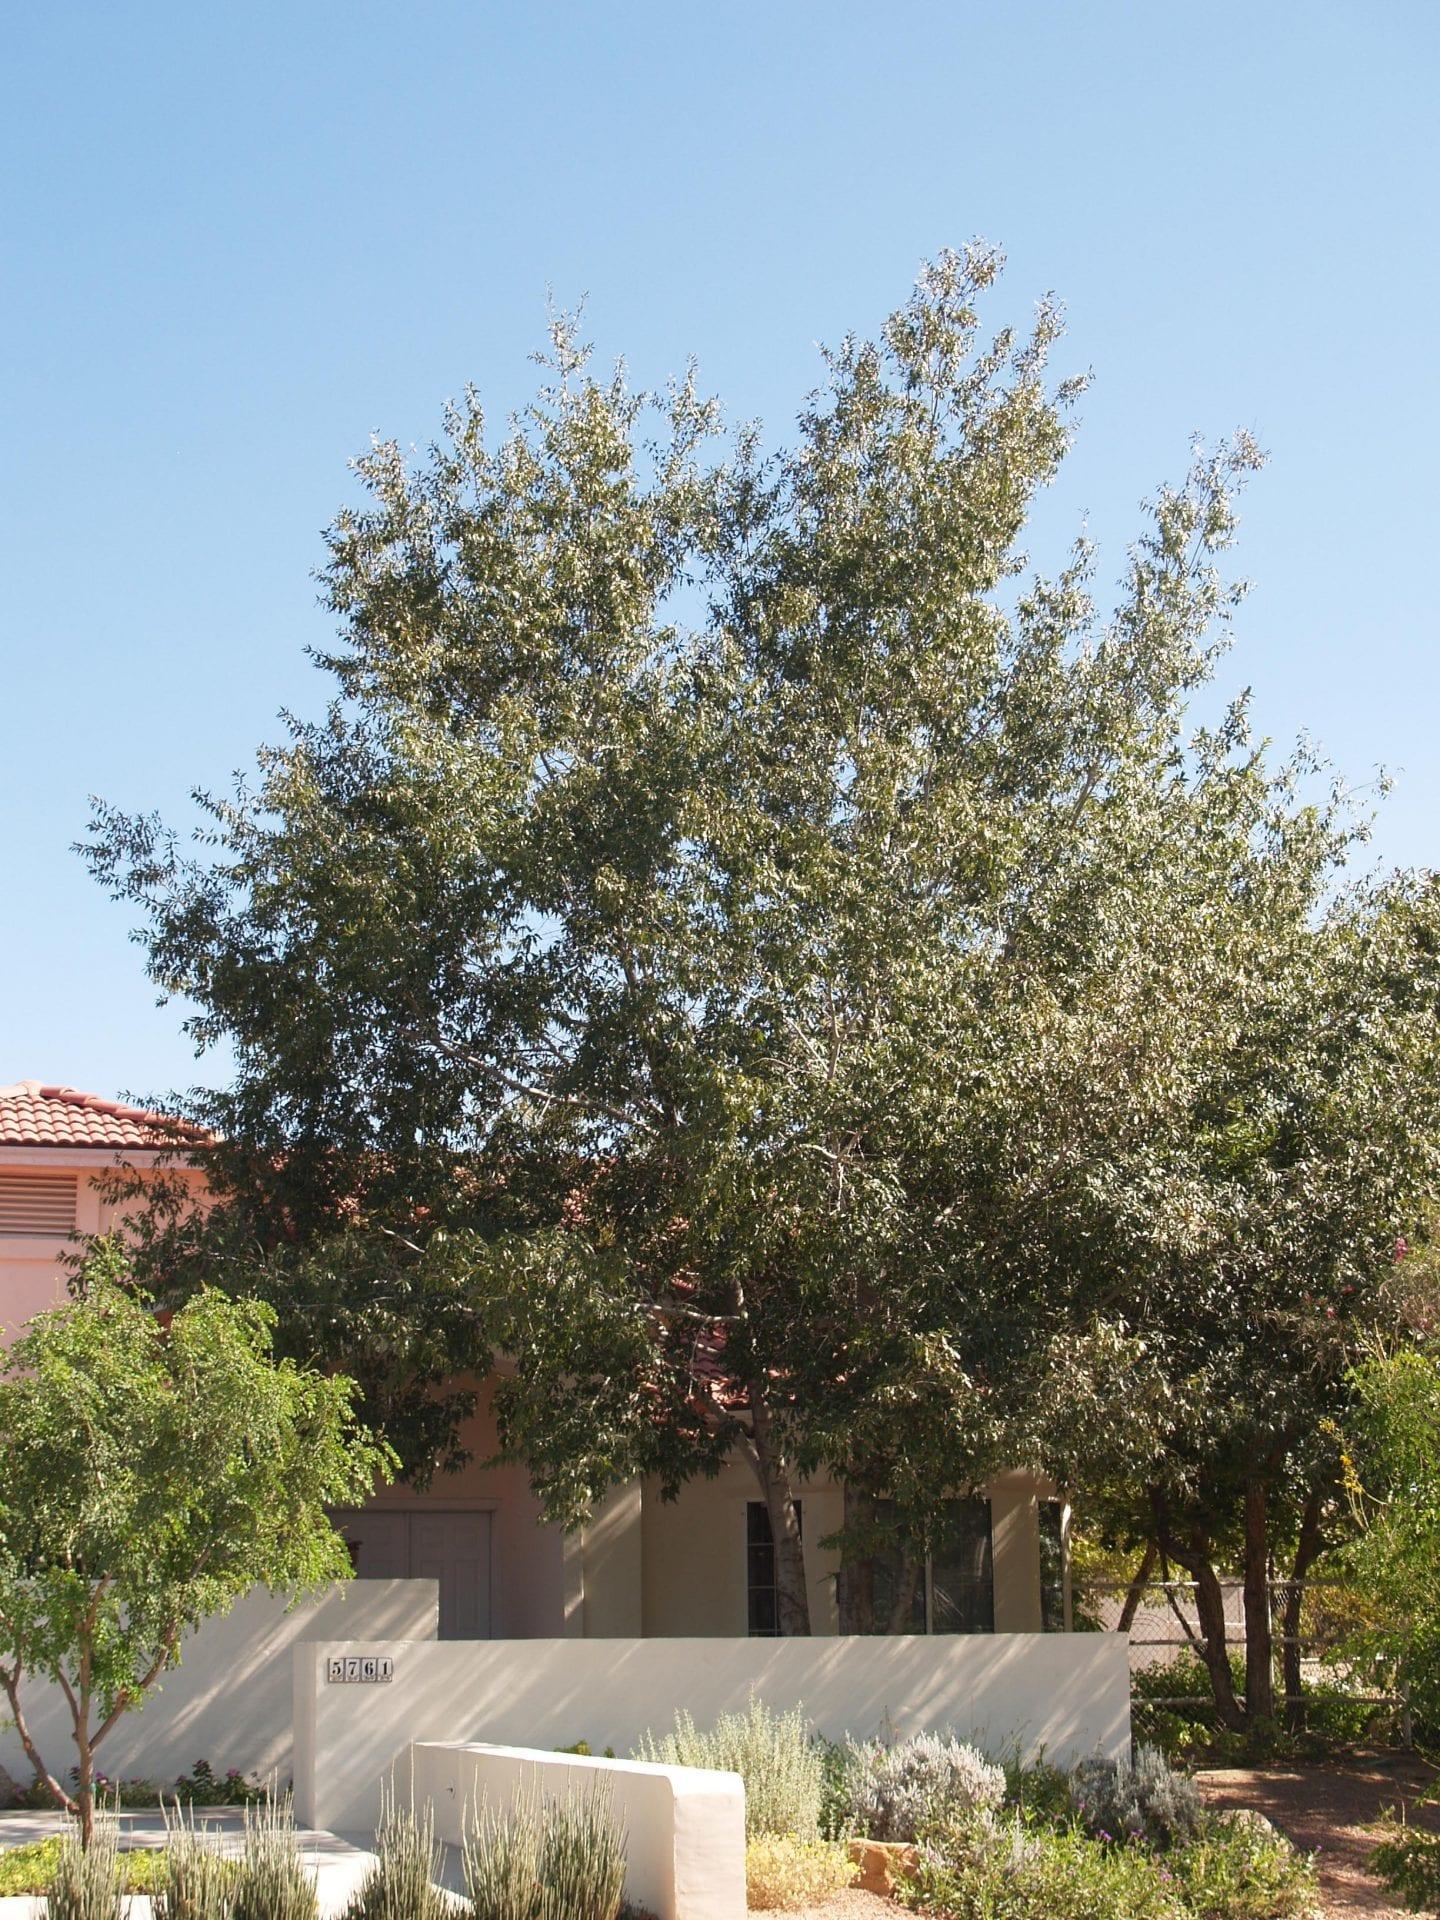 Quercus Canbyi Canby Oak Sierra Oak Mountain States